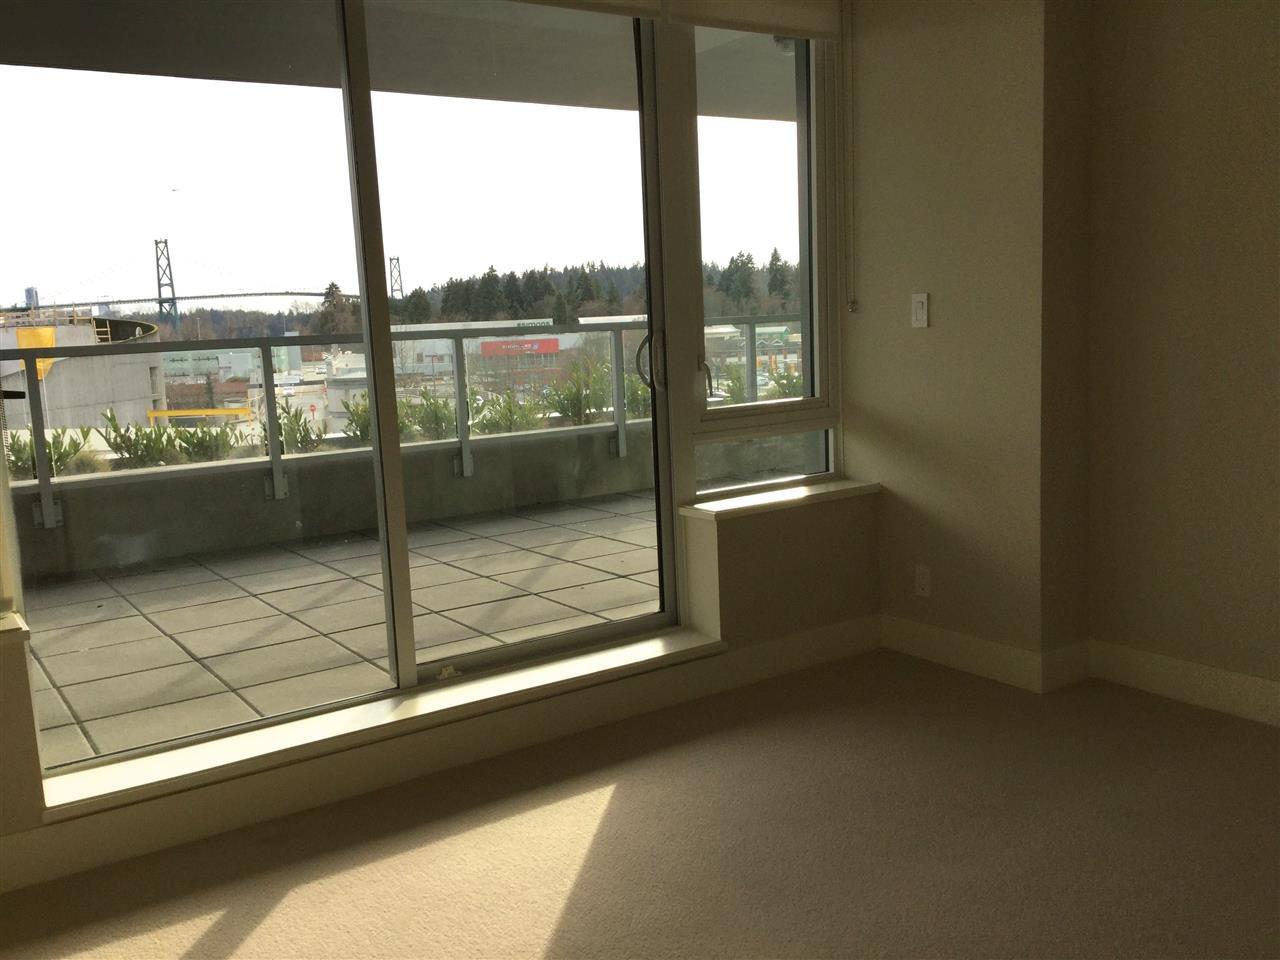 Photo 6: Photos: 304 866 ARTHUR ERICKSON Place in West Vancouver: Park Royal Condo for sale : MLS®# R2031932